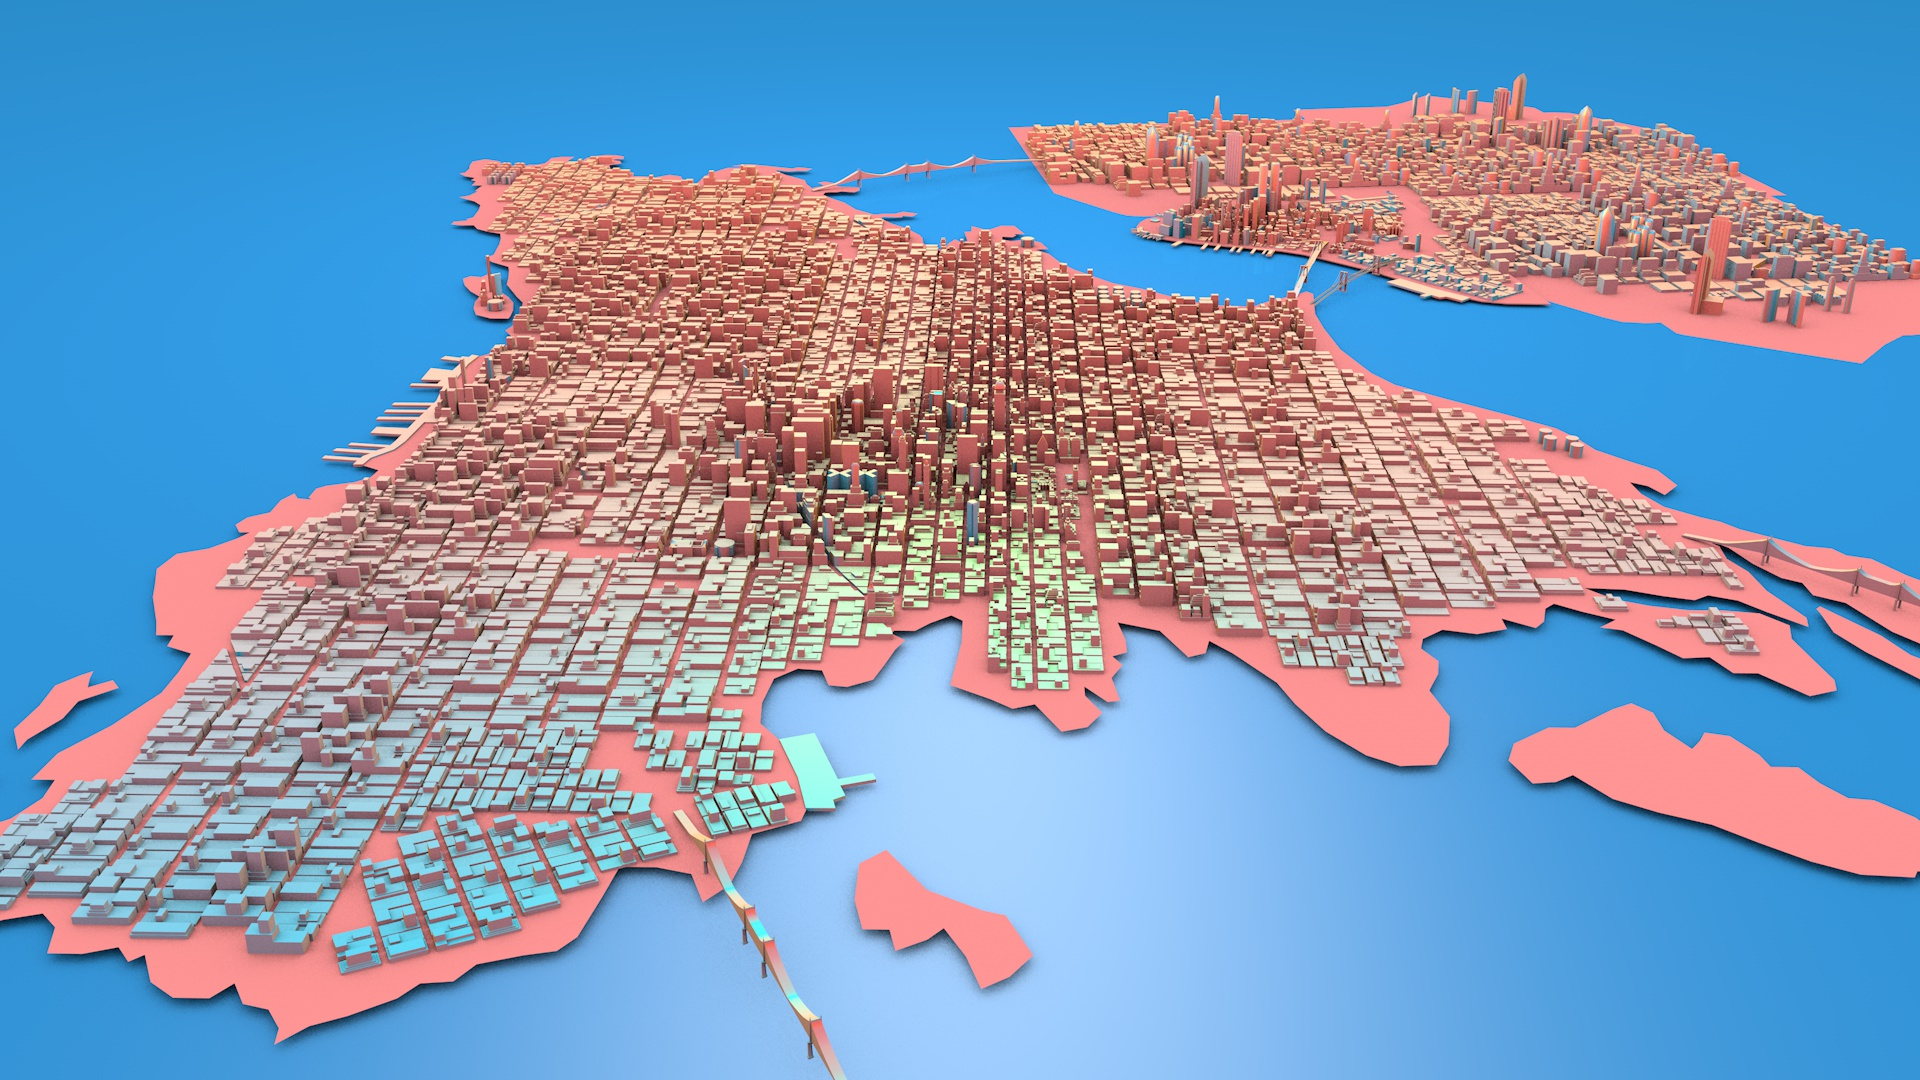 CITY ABOVE 7.jpg